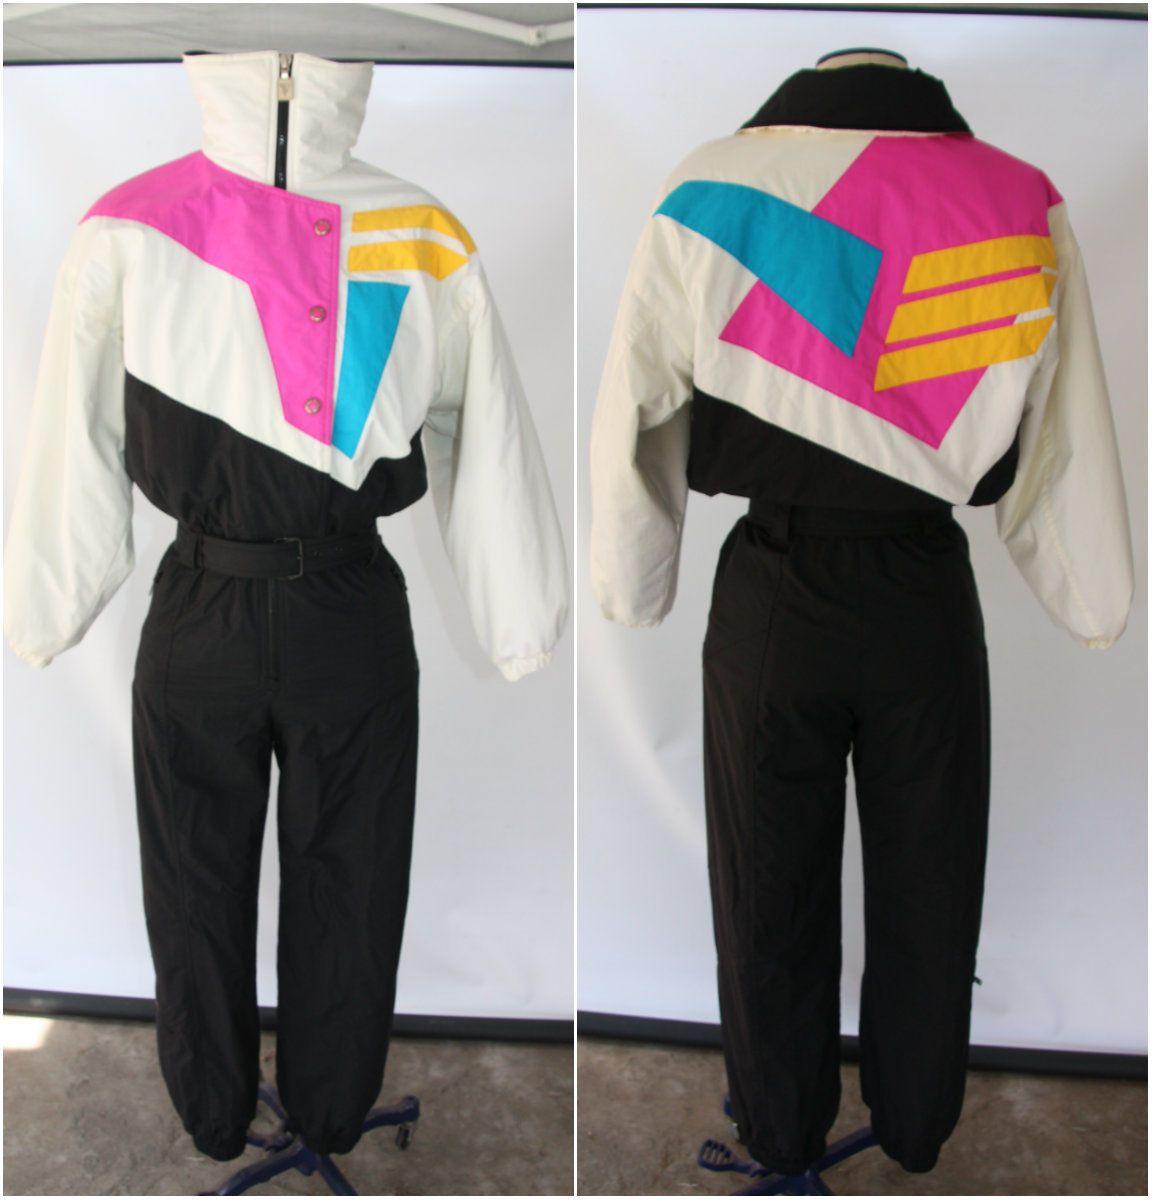 80s Ski Suit Women XS One Piece Ski Suit Retro Snow Suit Women XS Vintage Ski Suit Skiing Costume Ski Coveralls Snowboard Suit 80s Ski Wear